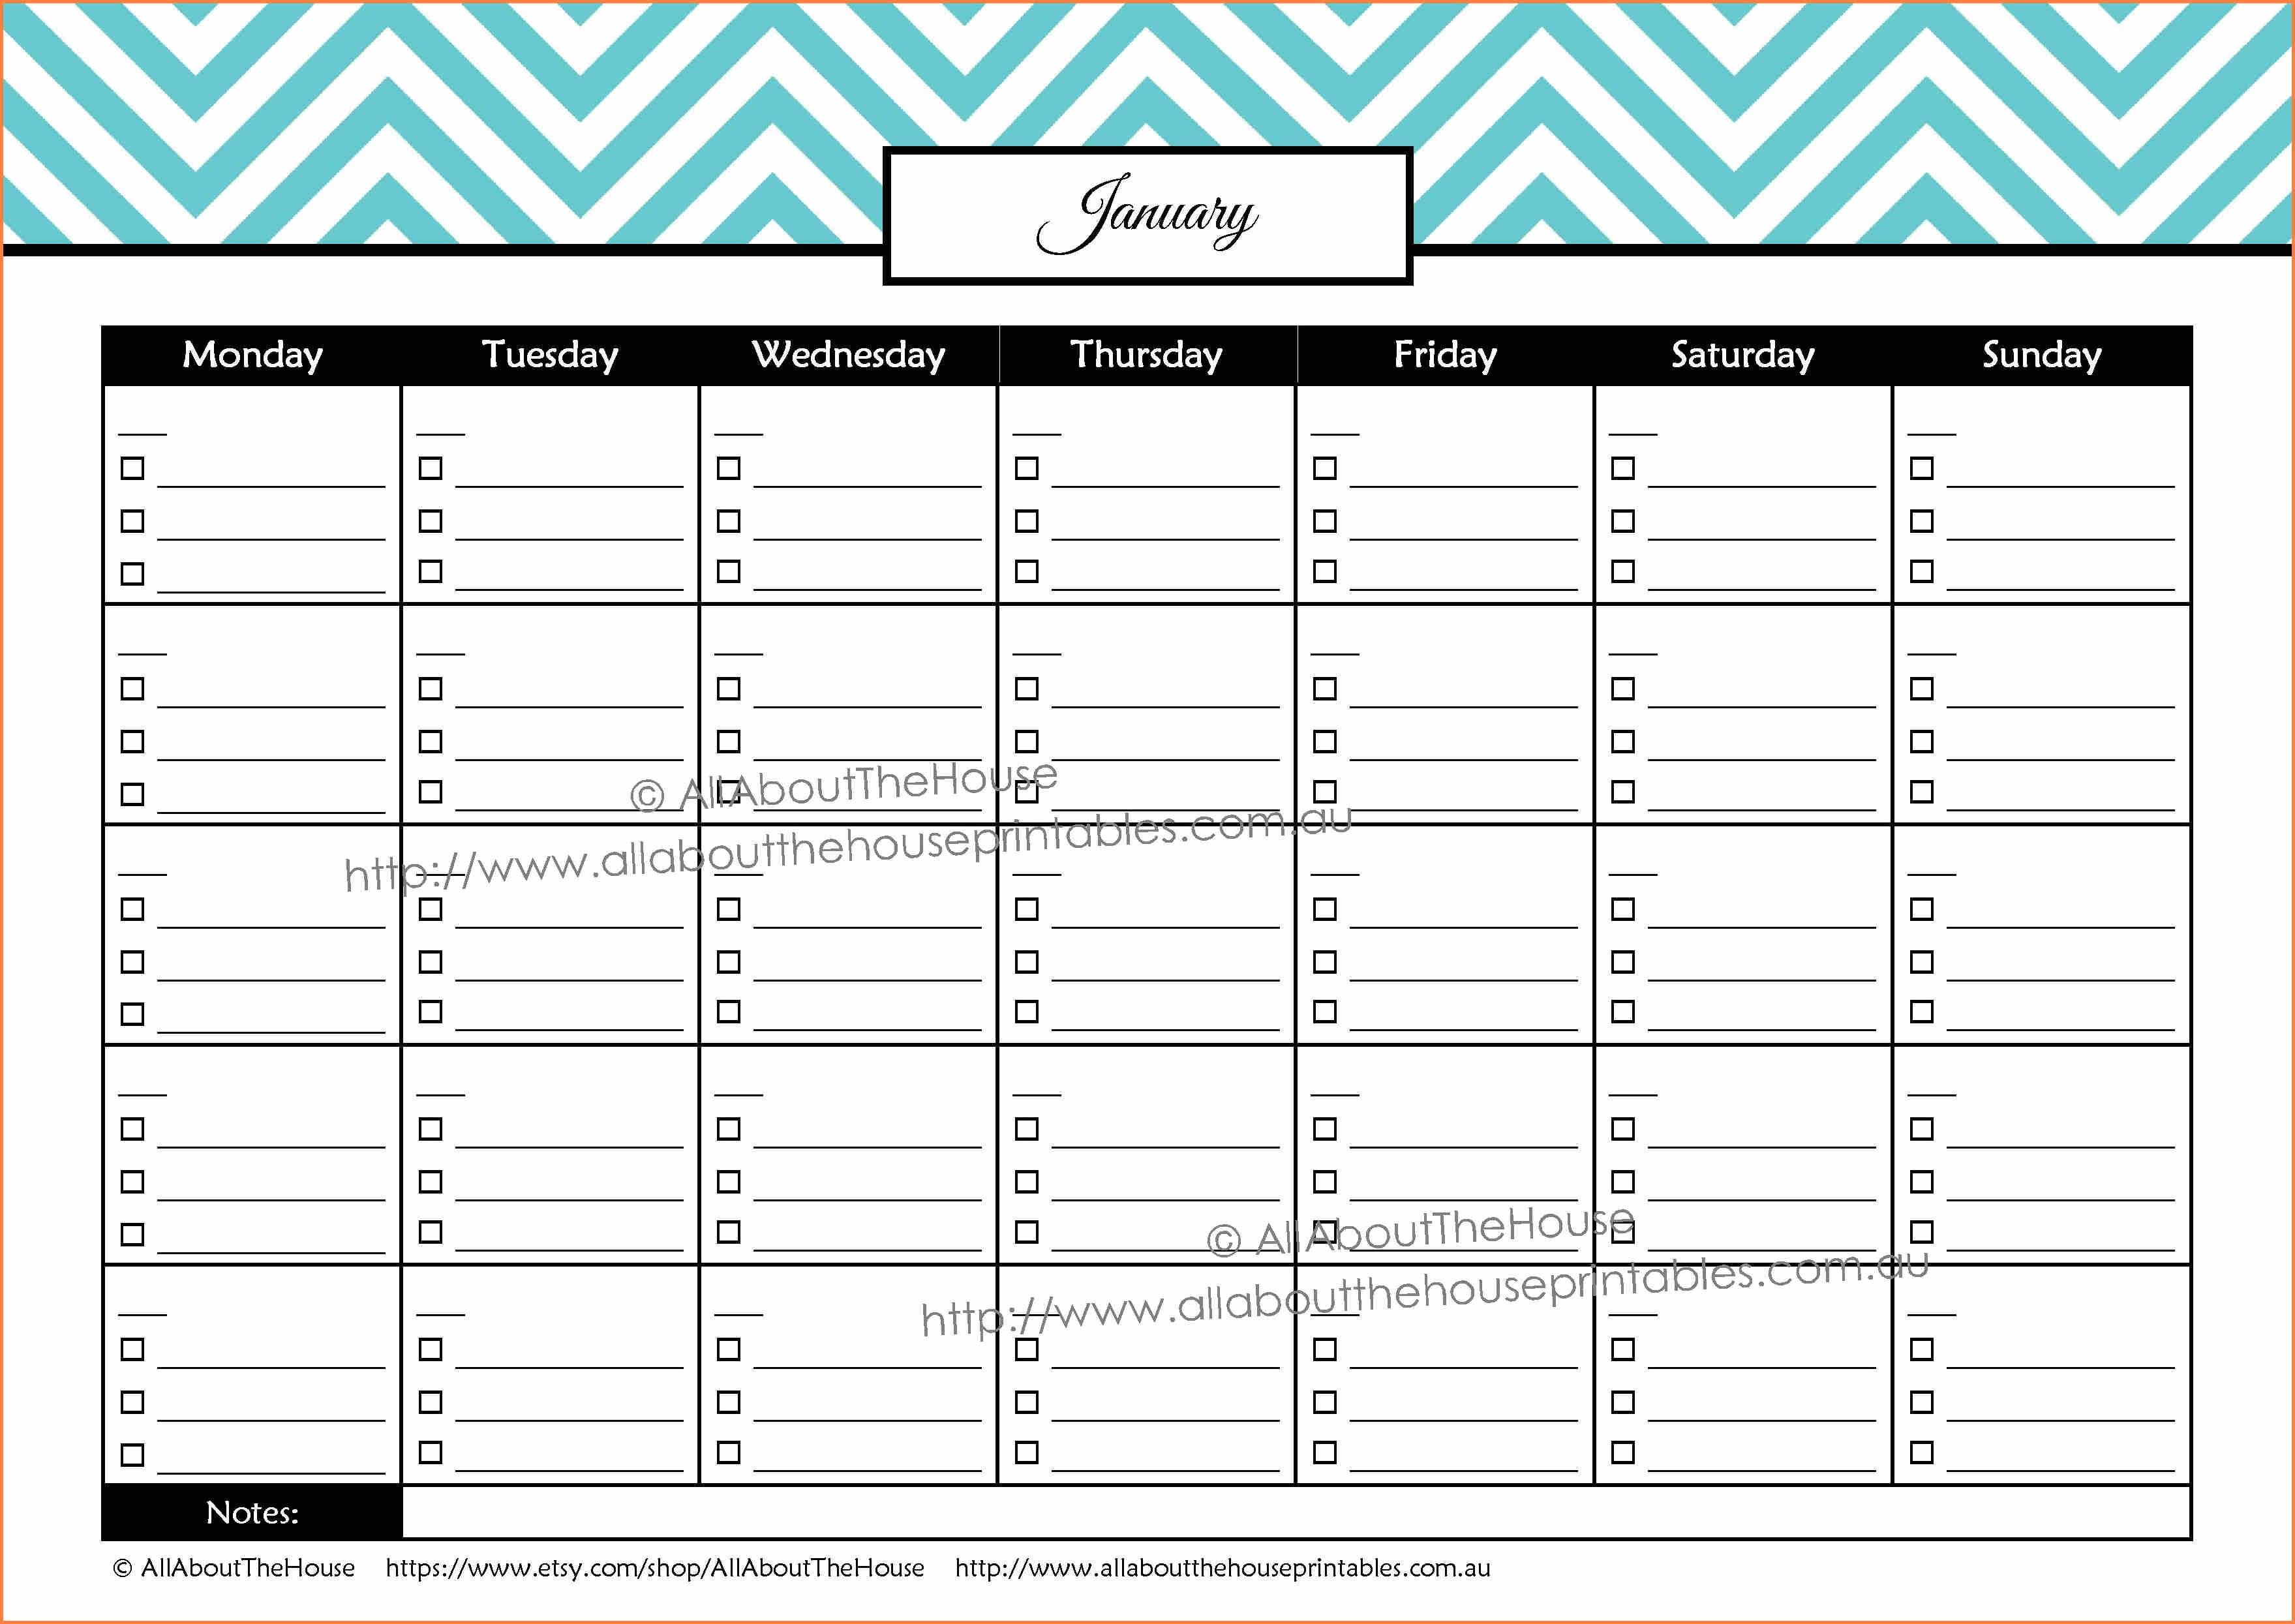 009 Bill Pay Calendar Template Ideas Paying Free Printable 2016 with Excel Calendar Template Bill Pay